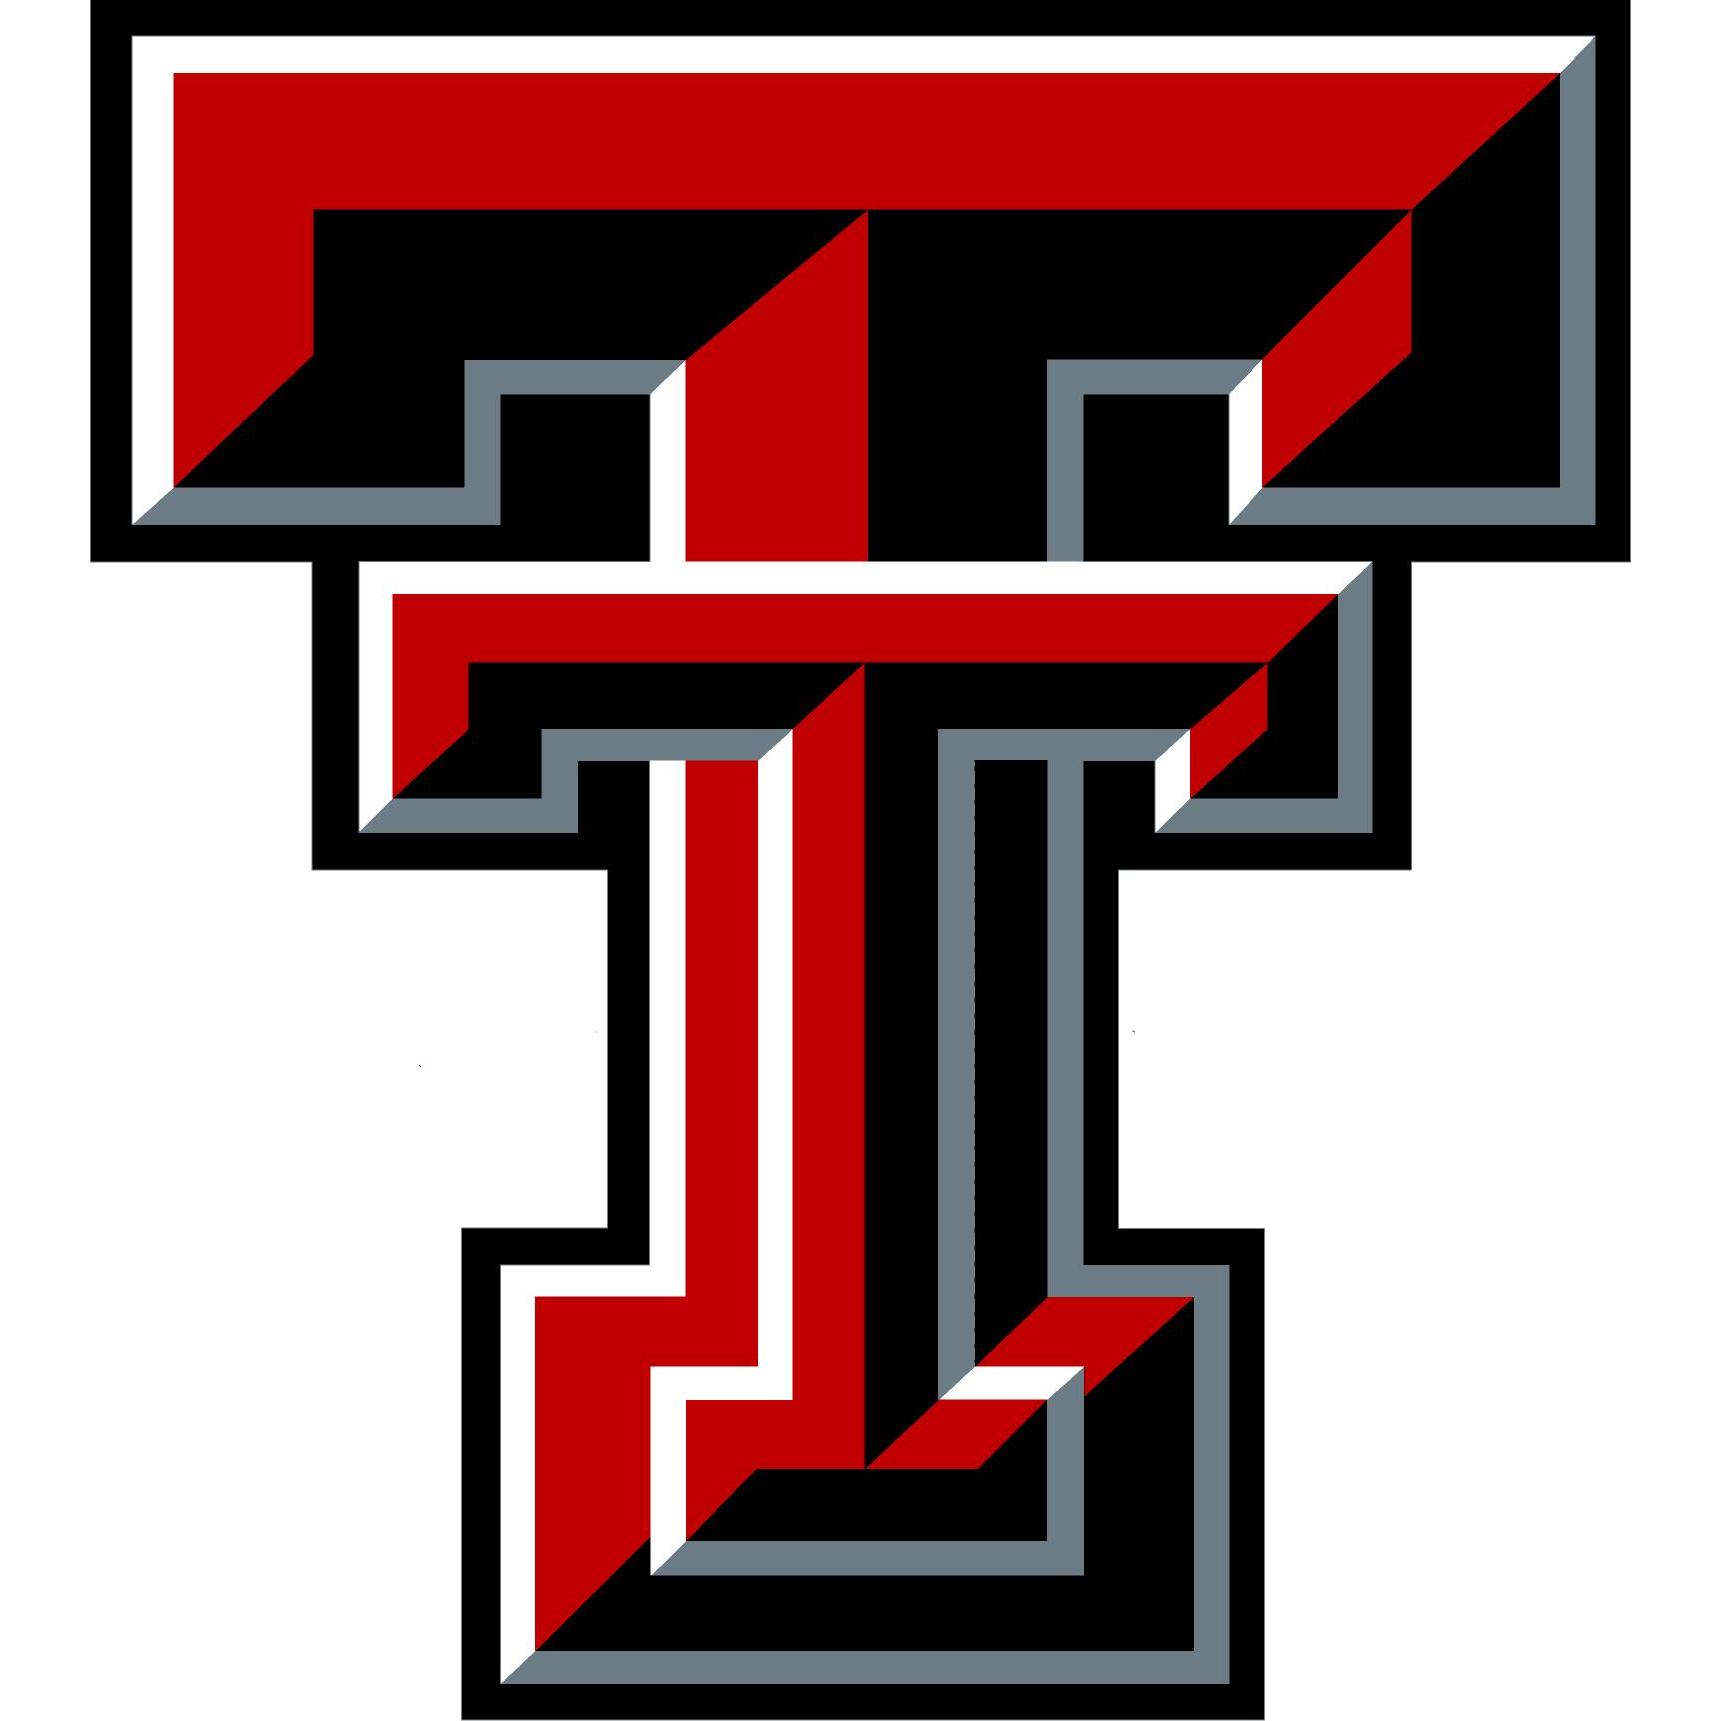 Lsu baseball clipart banner black and white download Texas Tech Stats 2018 - NCAA Baseball Stats, Batting & Pitching ... banner black and white download